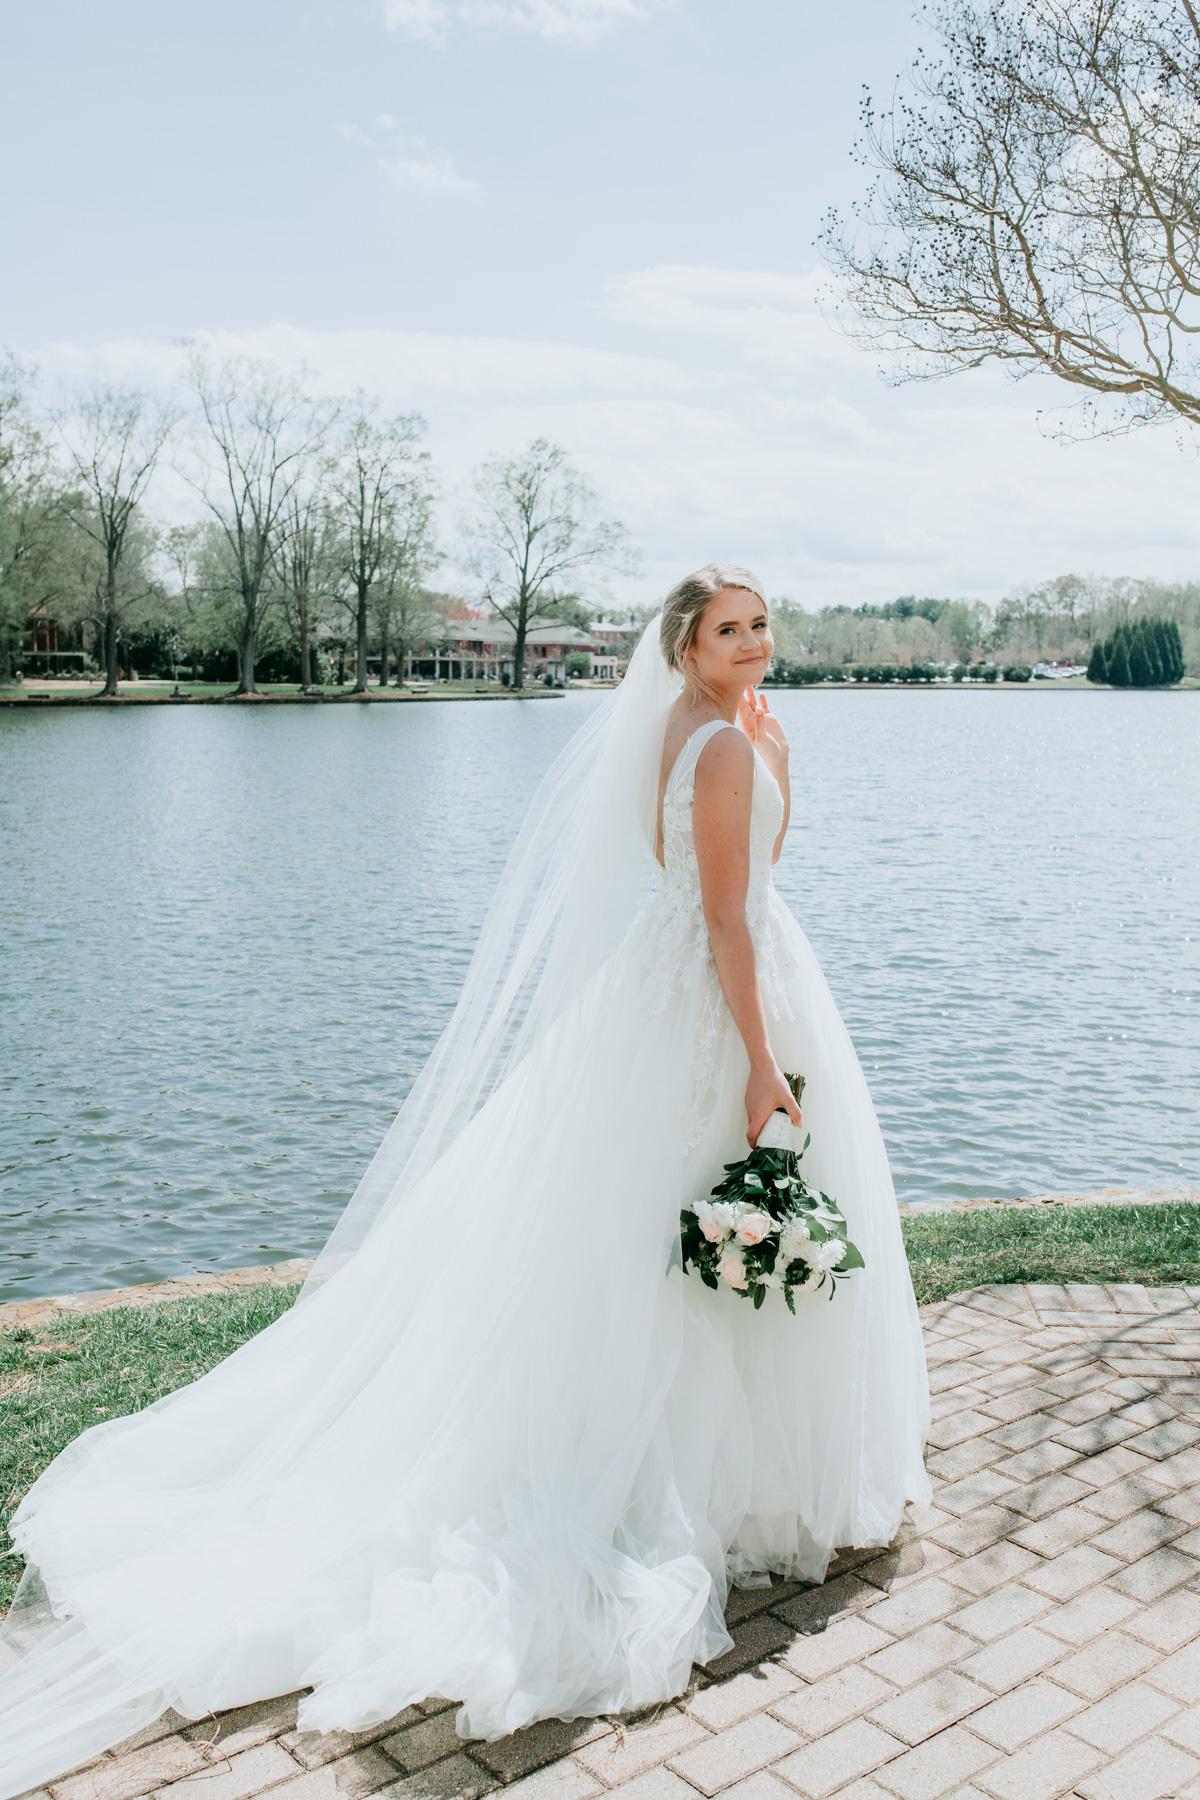 most-beautiful-brides-photos.jpg